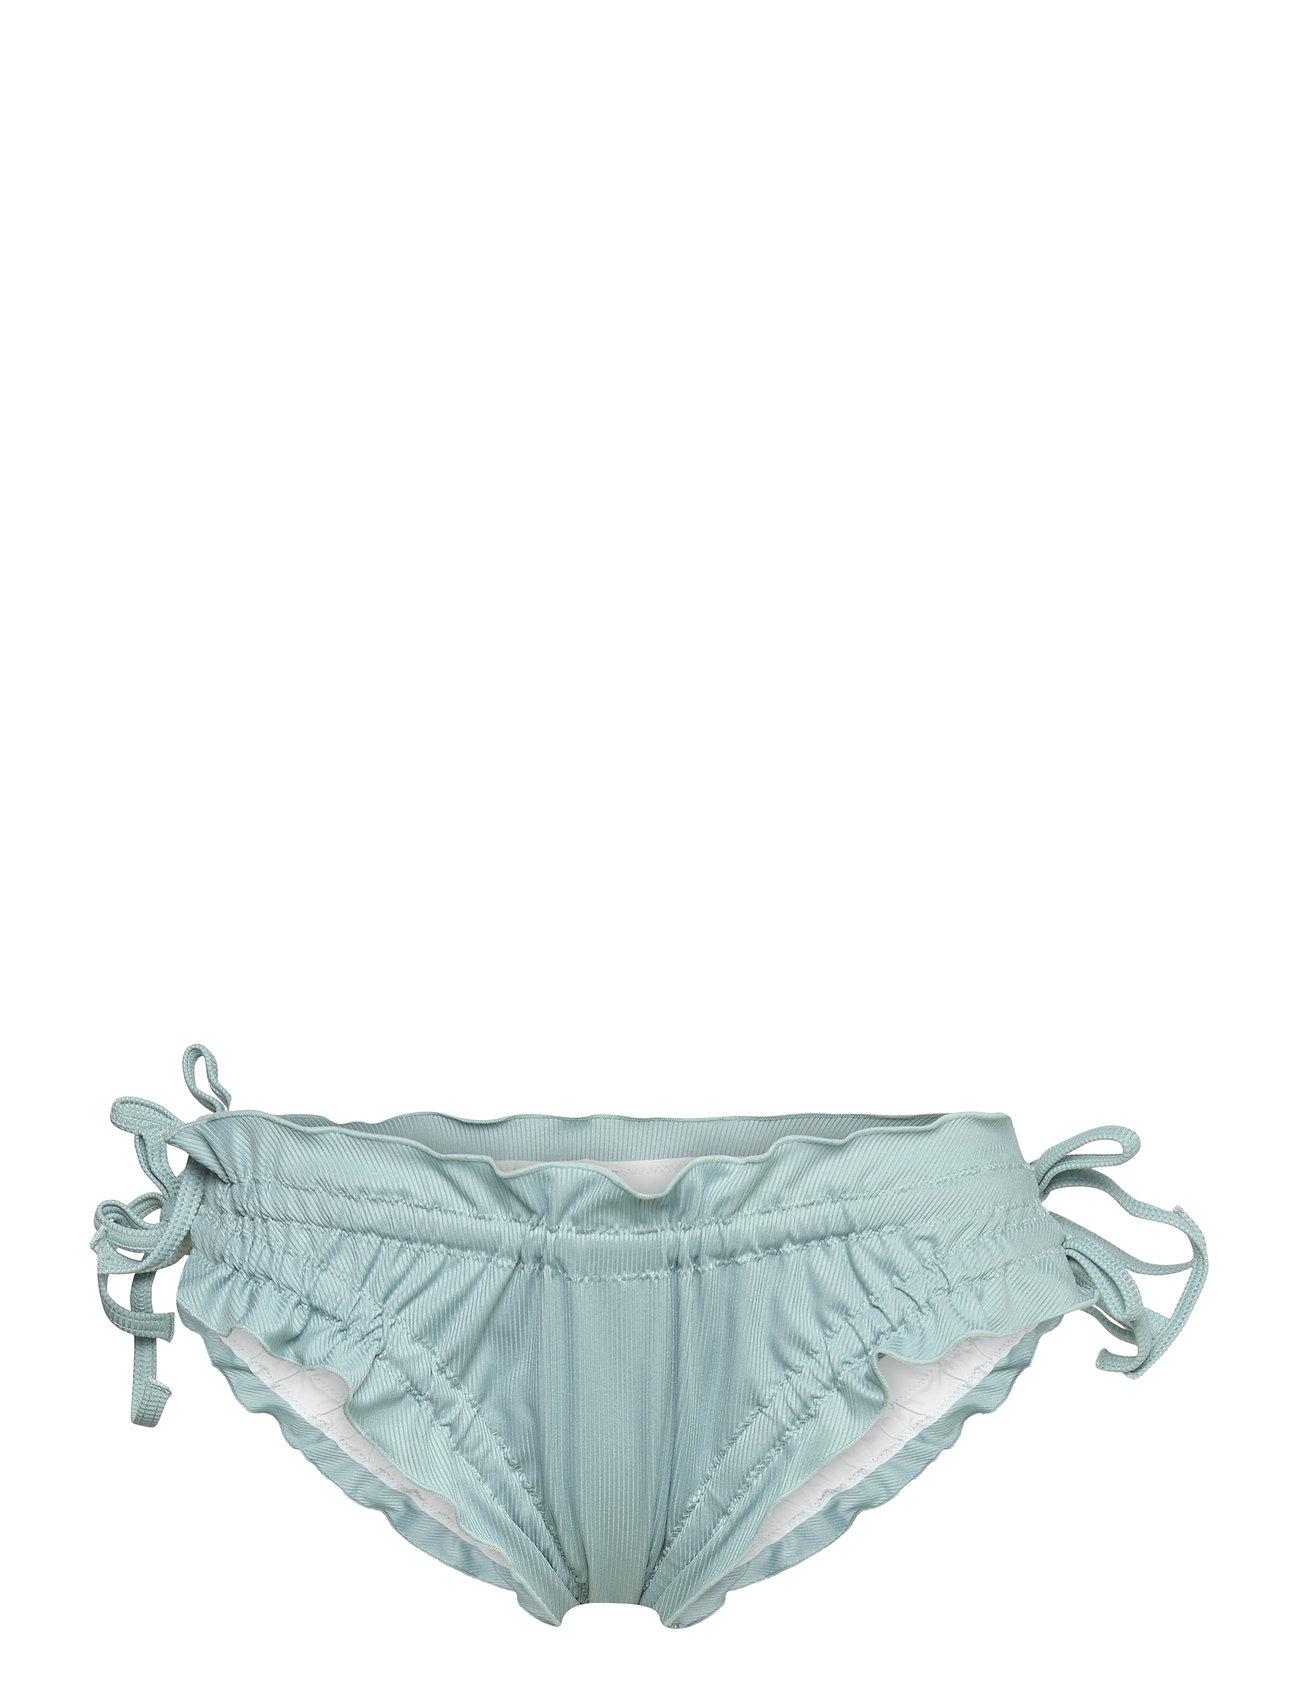 Ashley Bikini Bottom Bikinitrusser Grøn OW Intimates